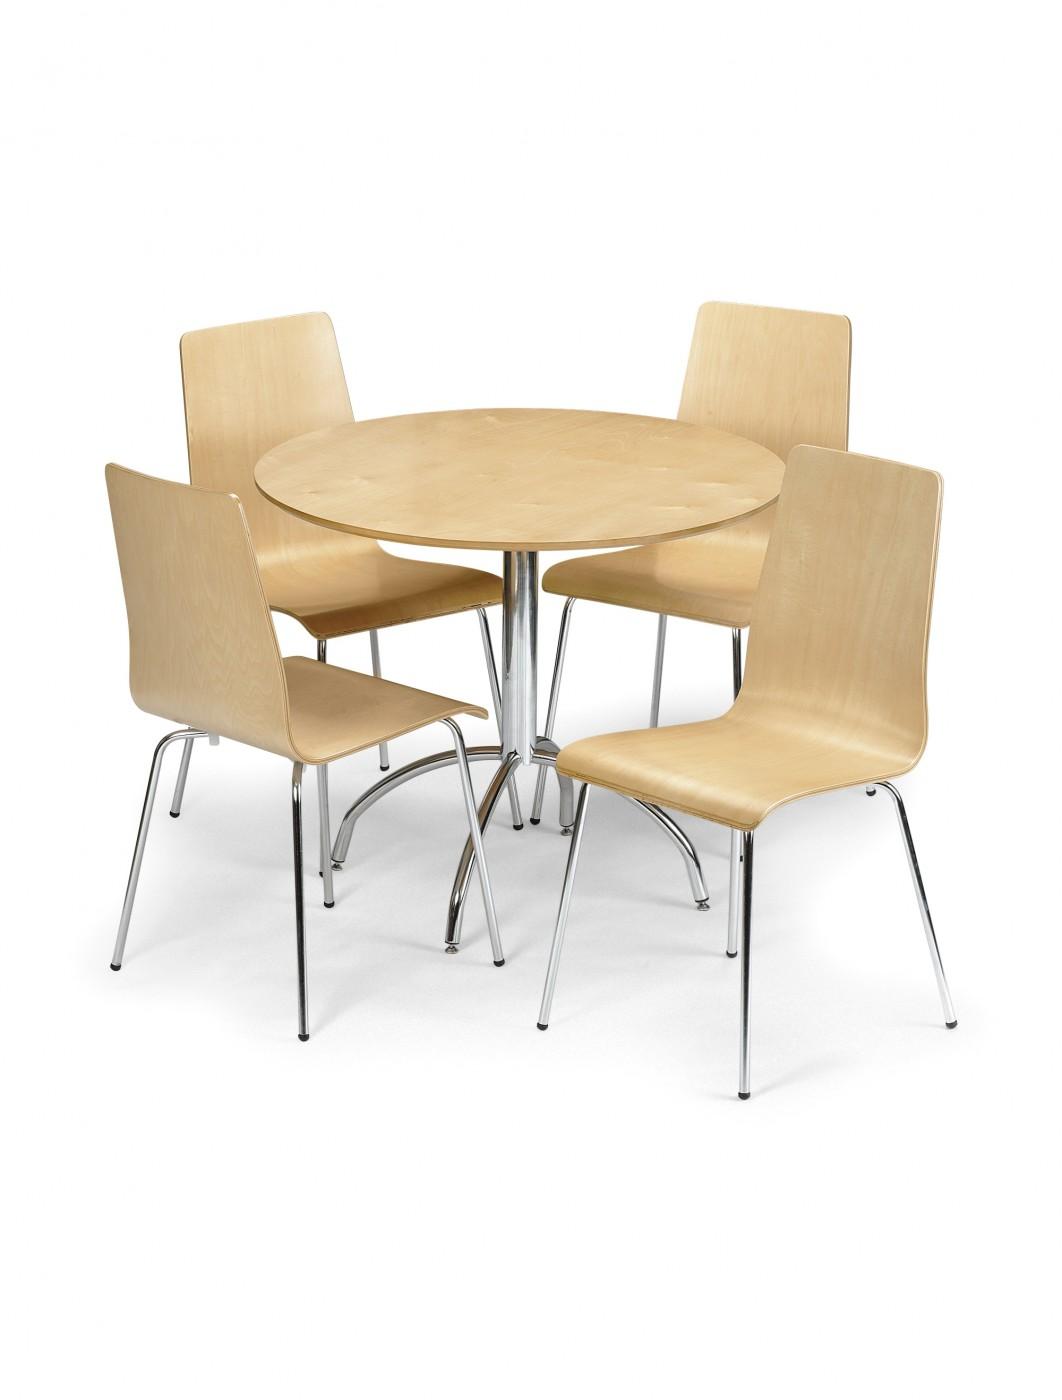 Dining Set MANSET 121 Office Furniture : 1380036195ceibty6Dmandymaplediningset from www.121officefurniture.co.uk size 1062 x 1400 jpeg 96kB